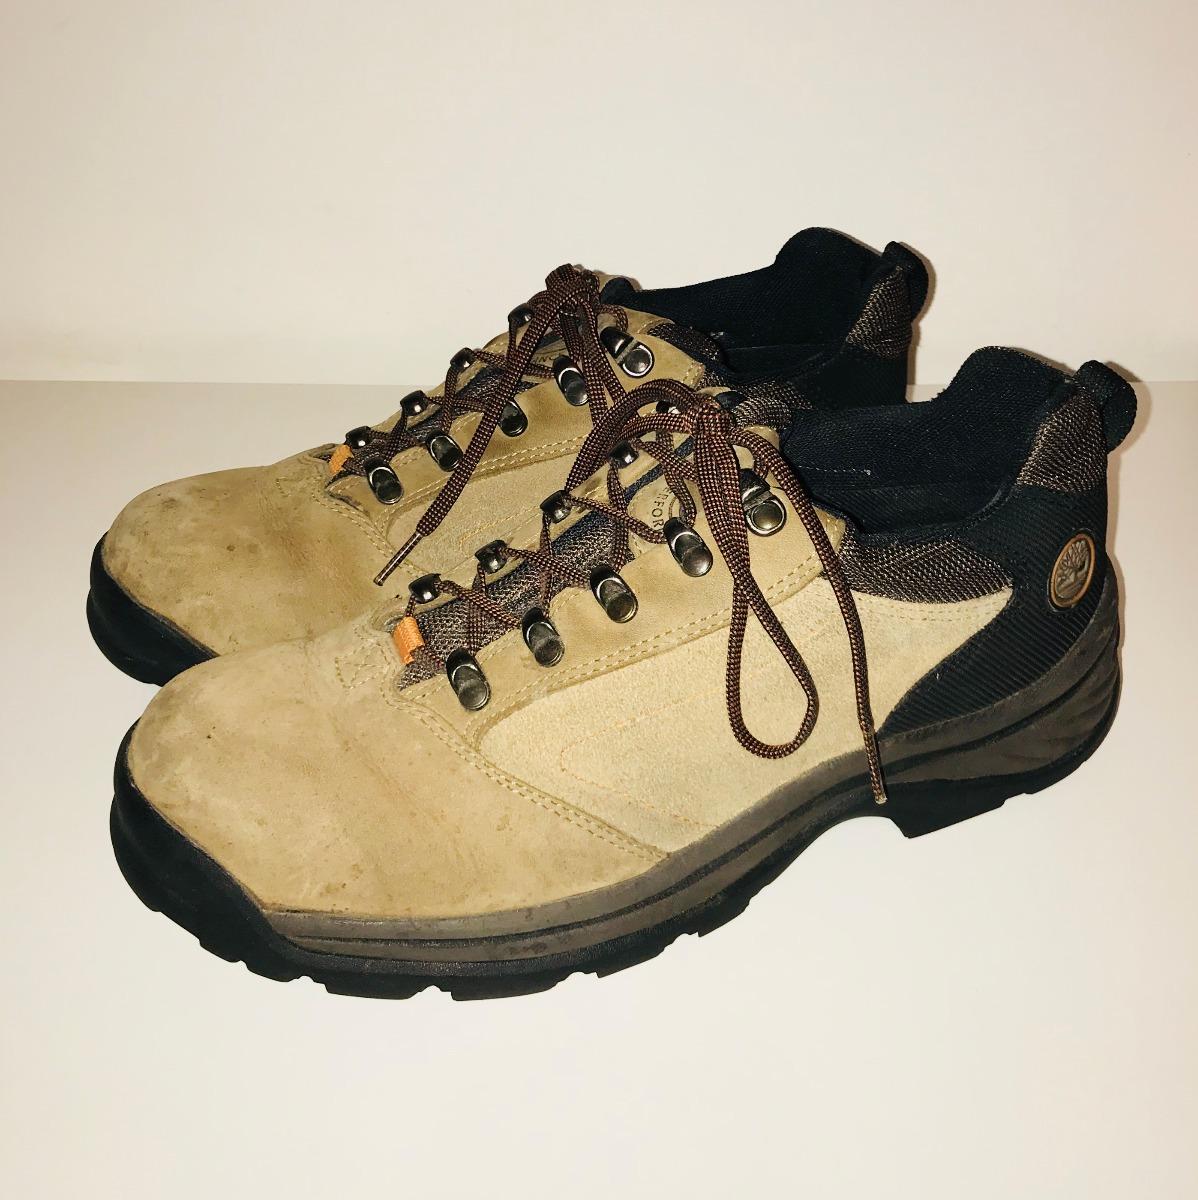 P C De A S ¡ L I B E Zapatos Timberland Xwxrtdqgr M Gamuza 300 00 1 trCshQd